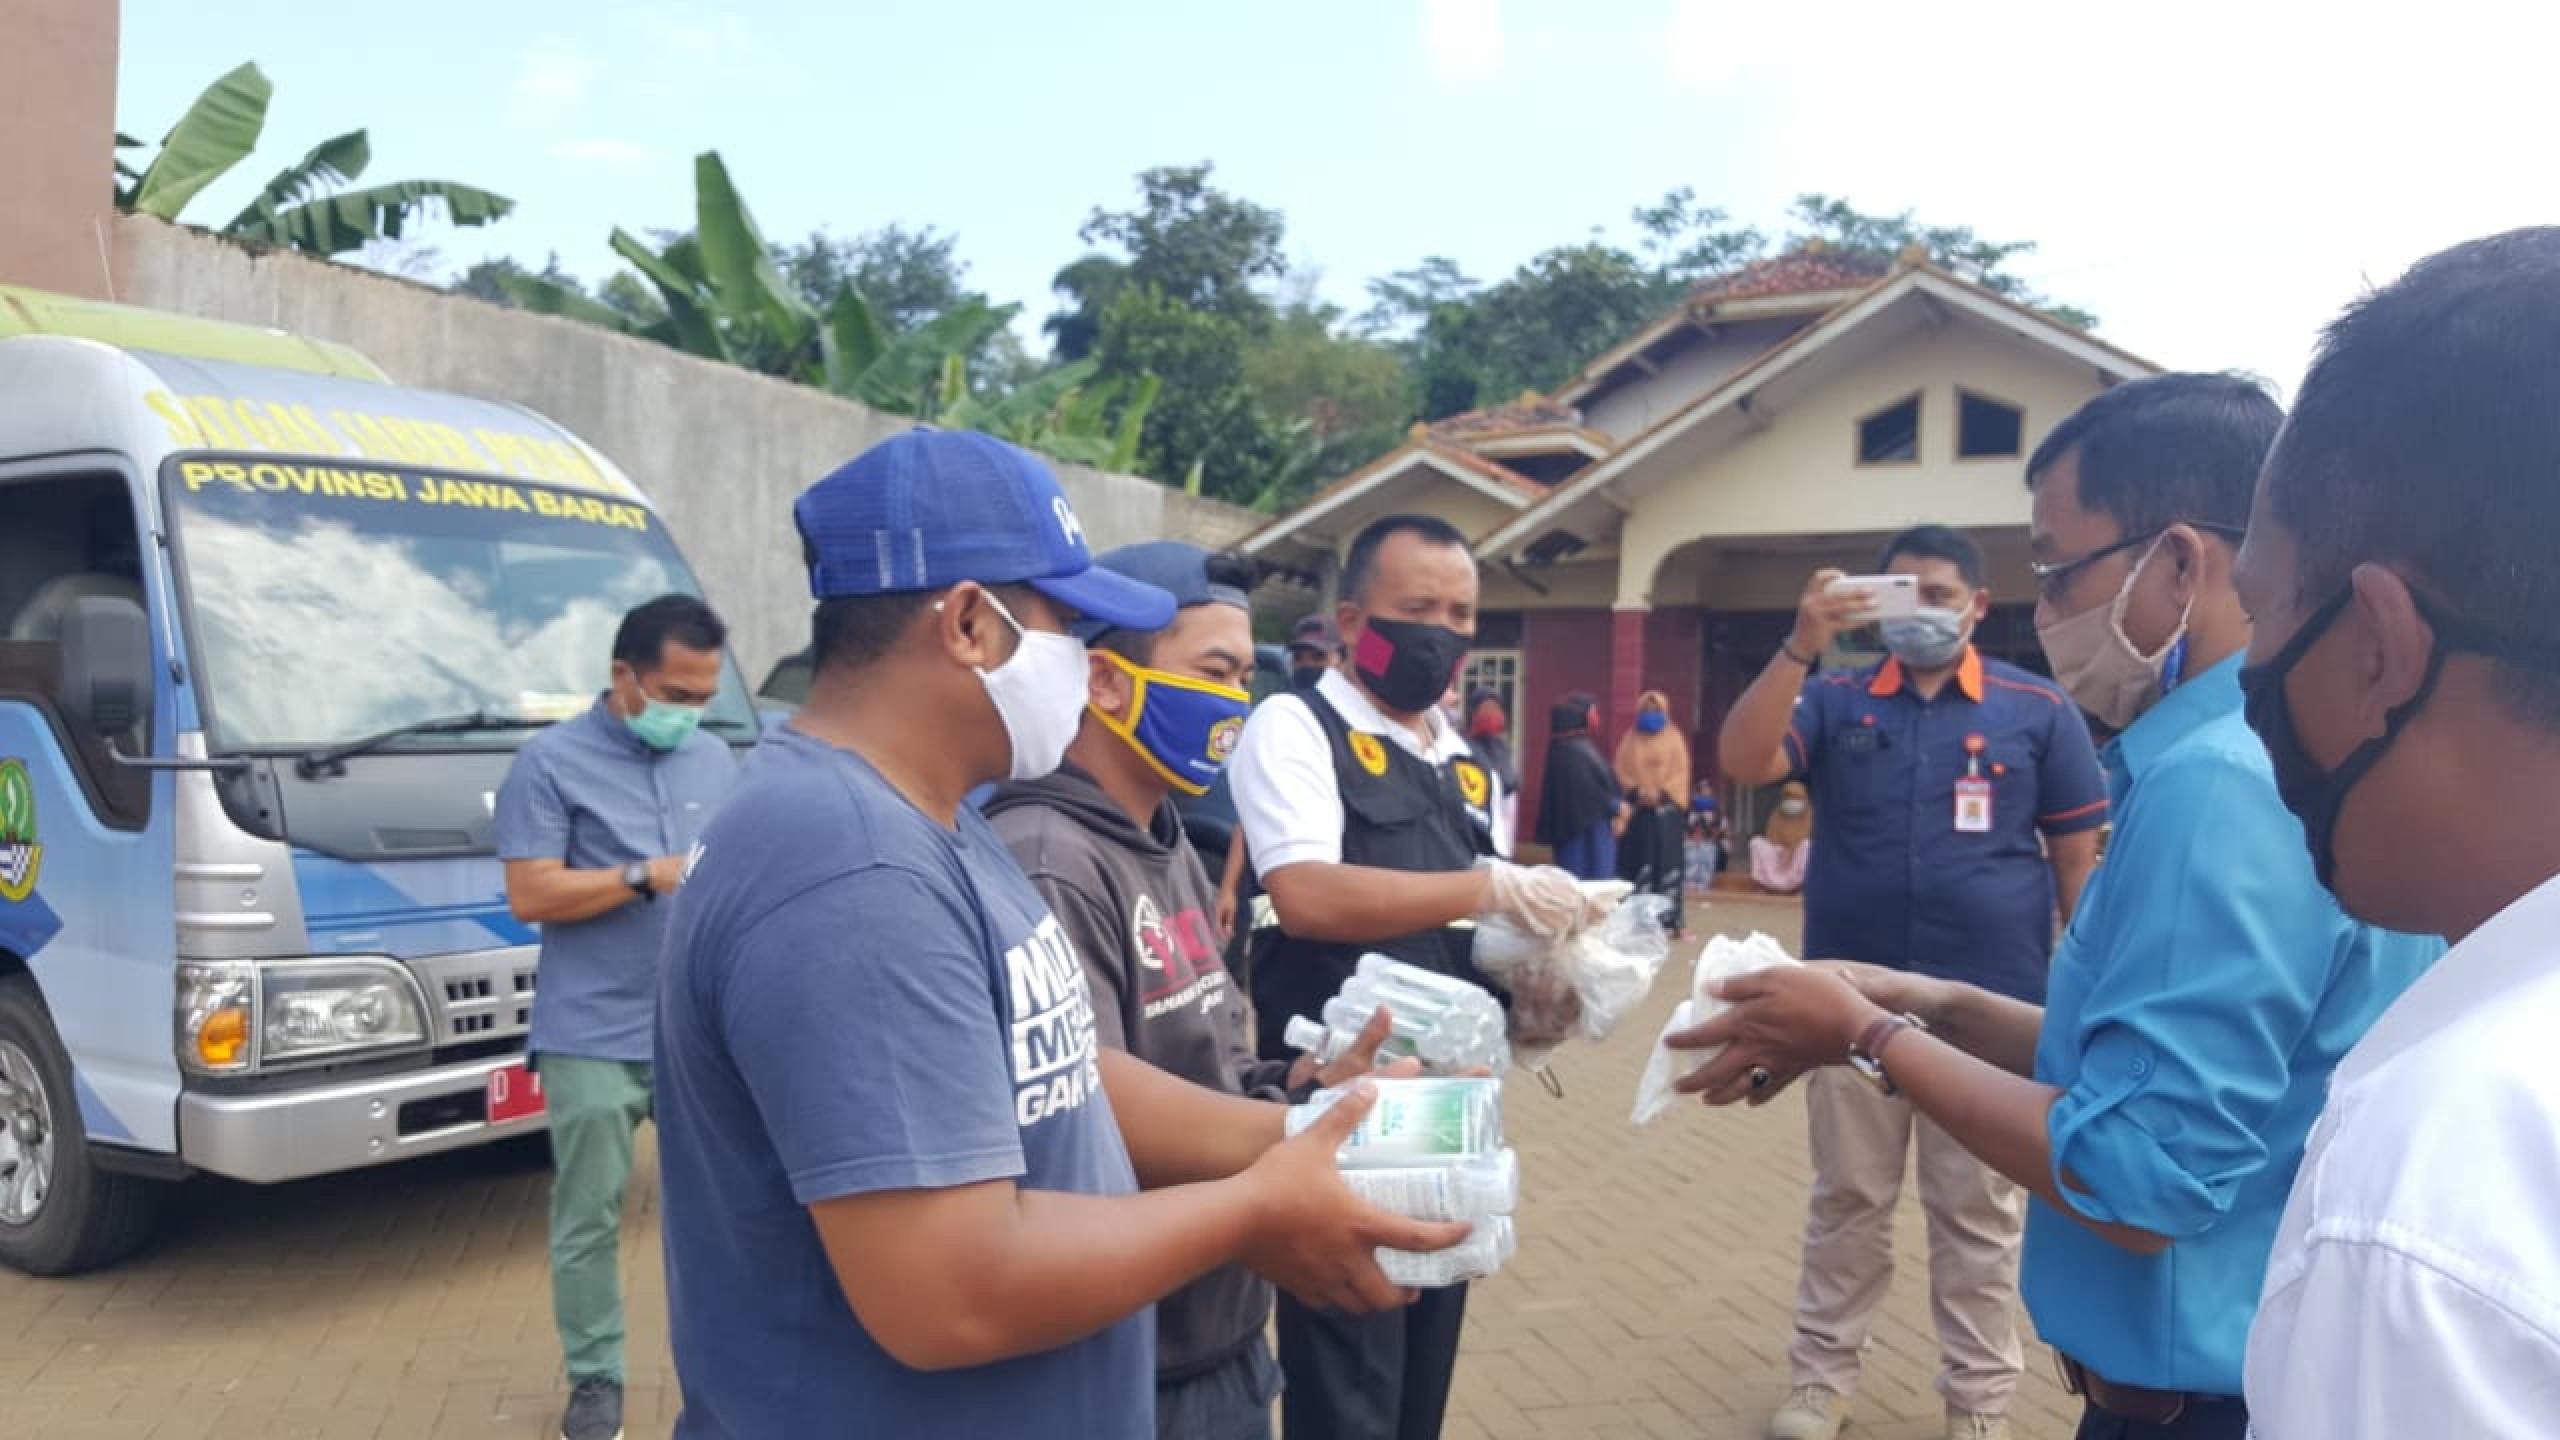 saberpungli jabar - Saber Pungli bersama MAPI Jabar Melaksanakan Baksos di Bandung Barat